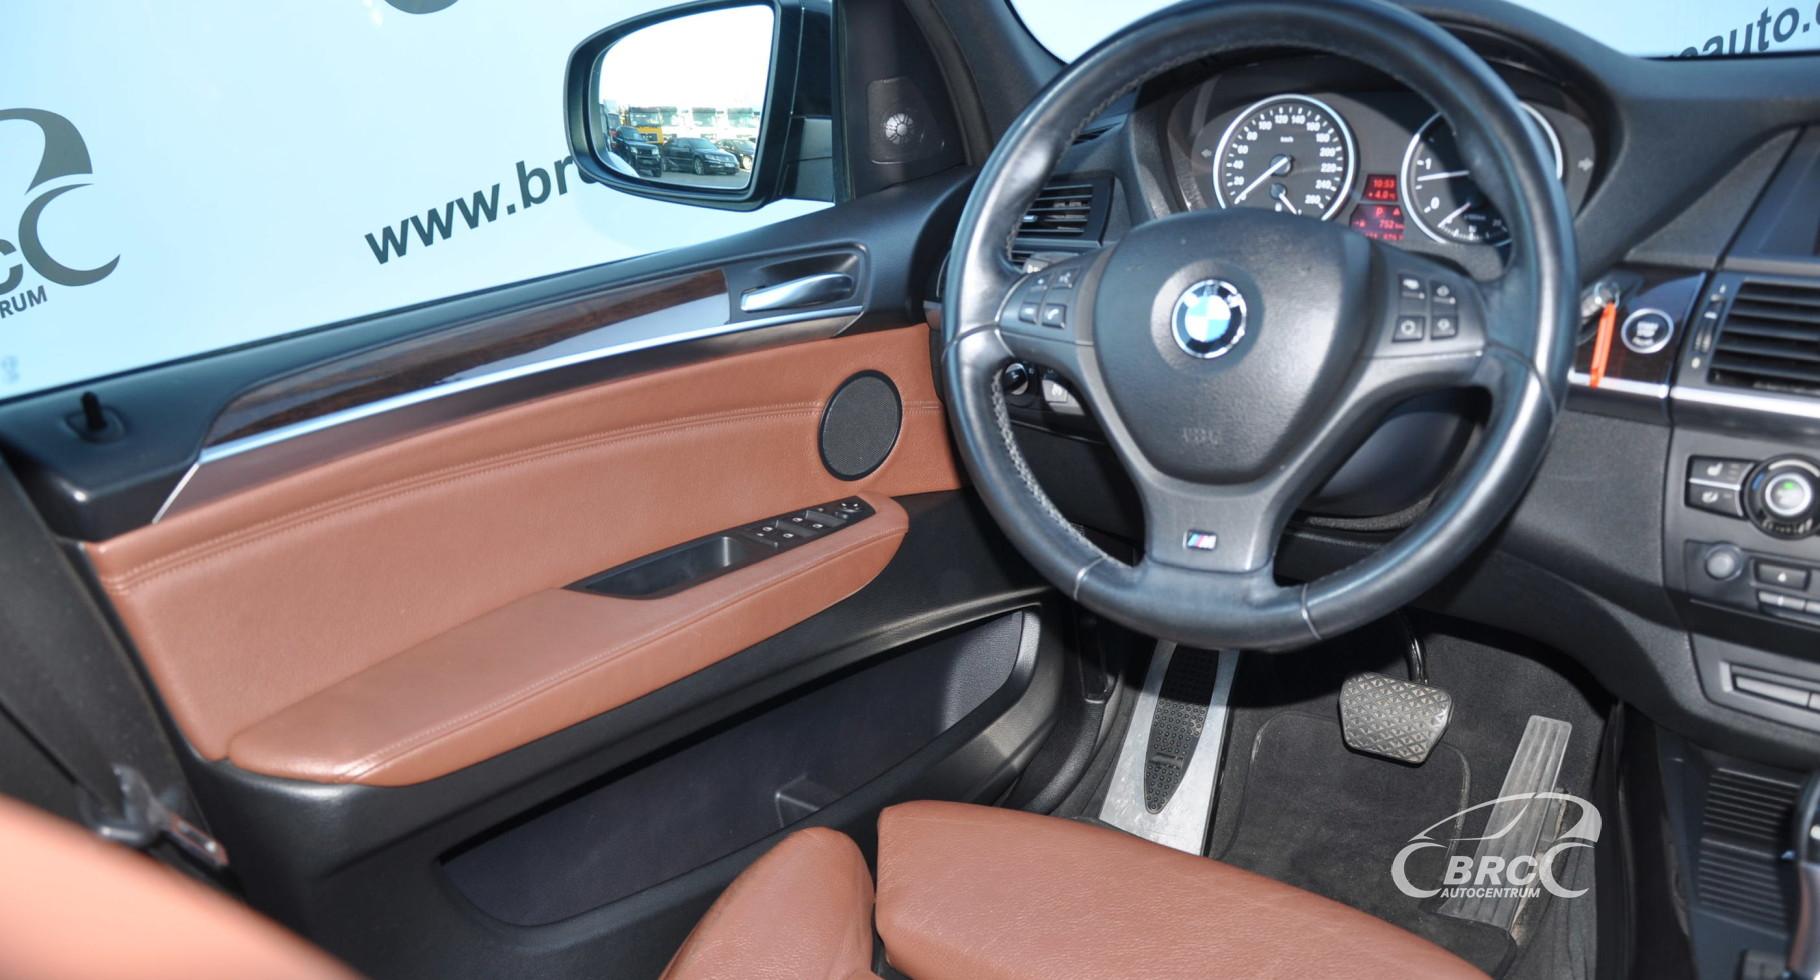 BMW X5 xDrive 30d M-Pakett Automatas